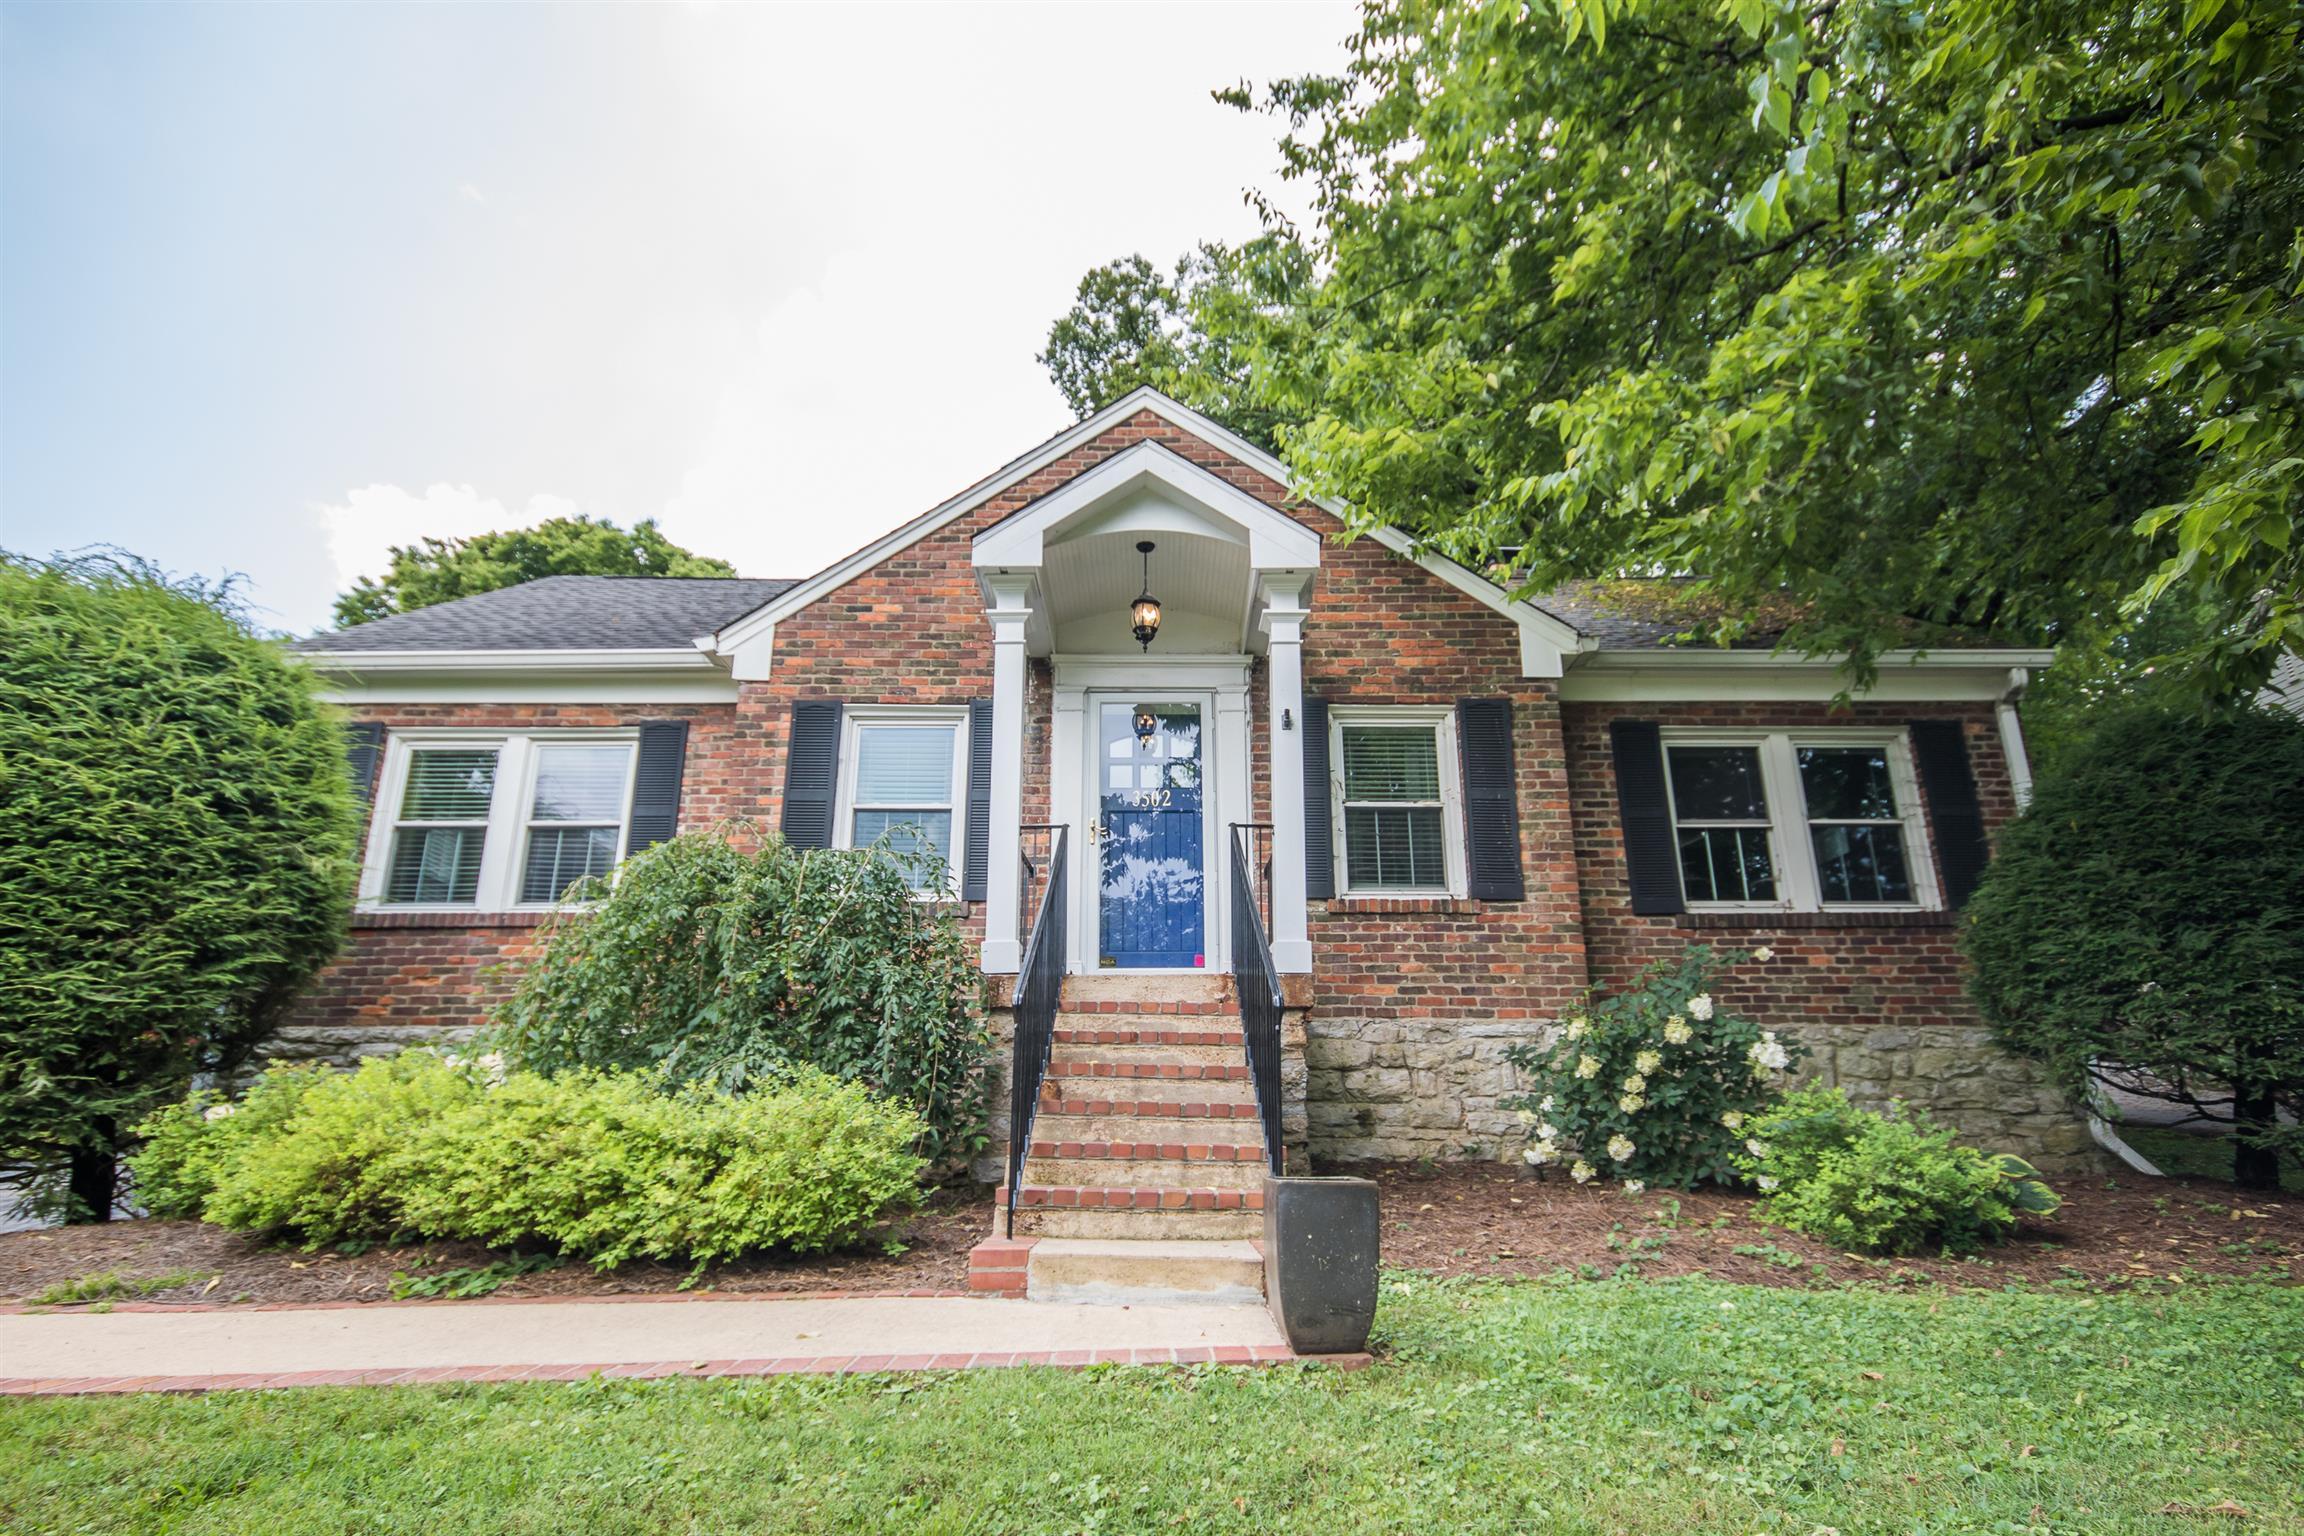 3502 Wilbur Pl, Nashville, TN 37204 - Nashville, TN real estate listing